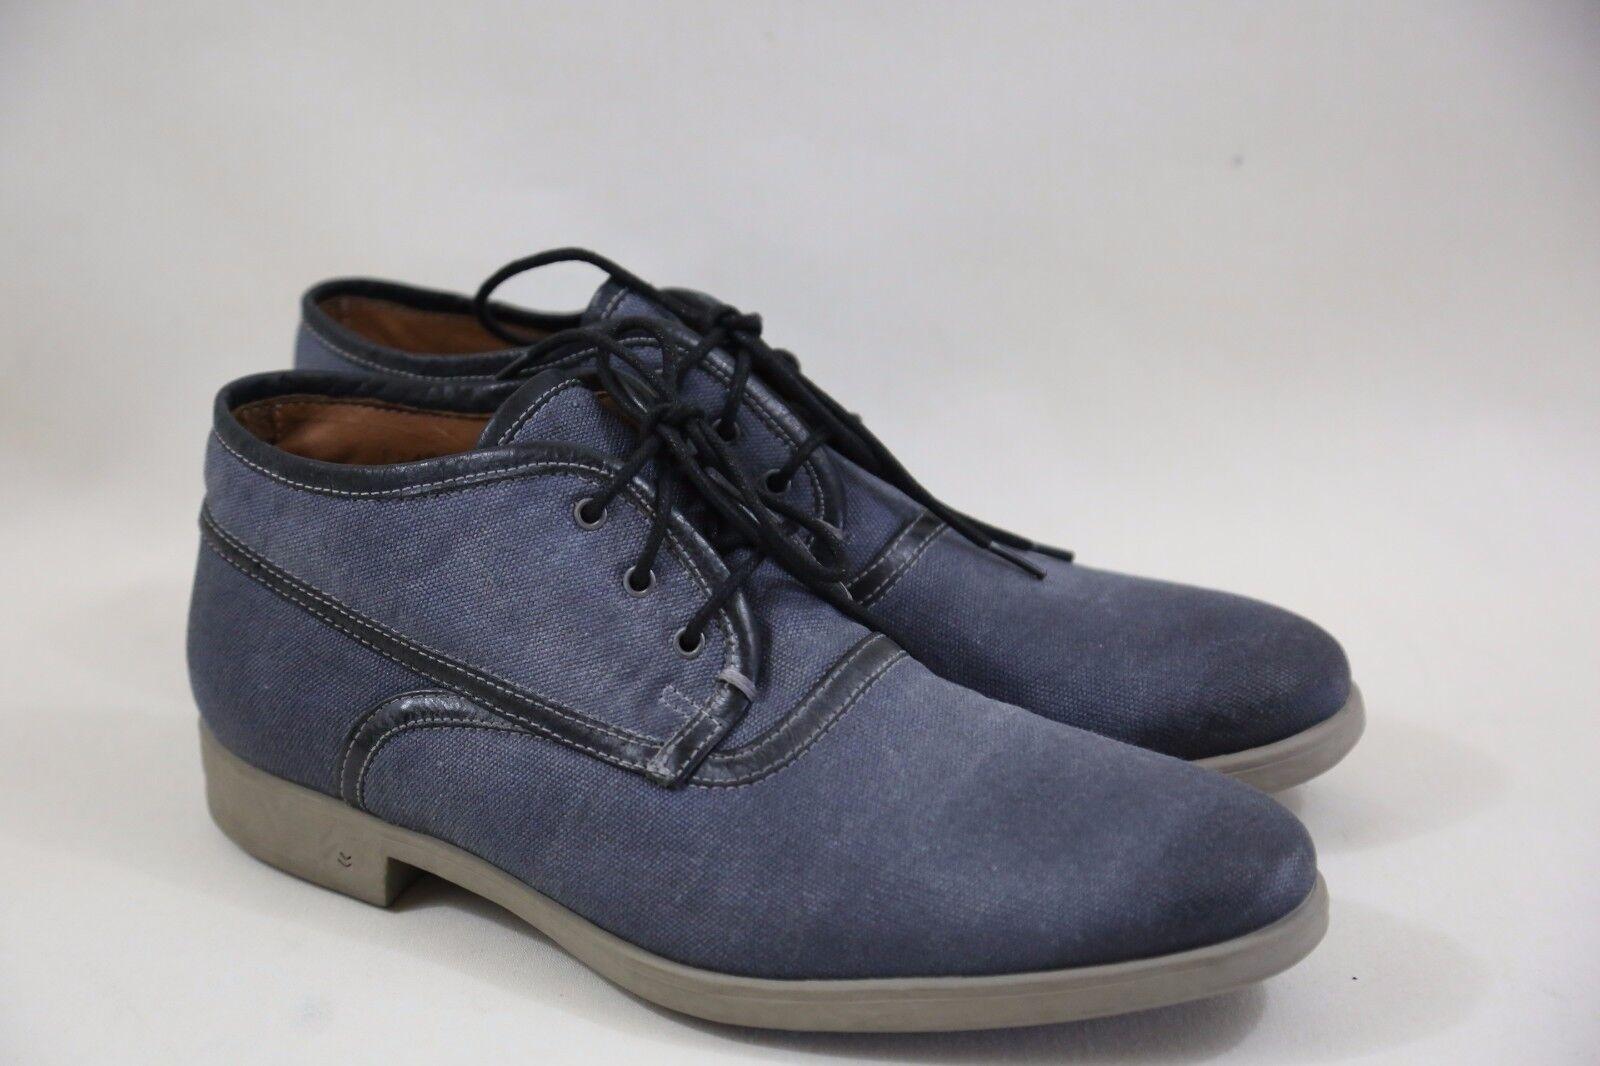 John Varvatos Collection Chukka Boots Size 10 M